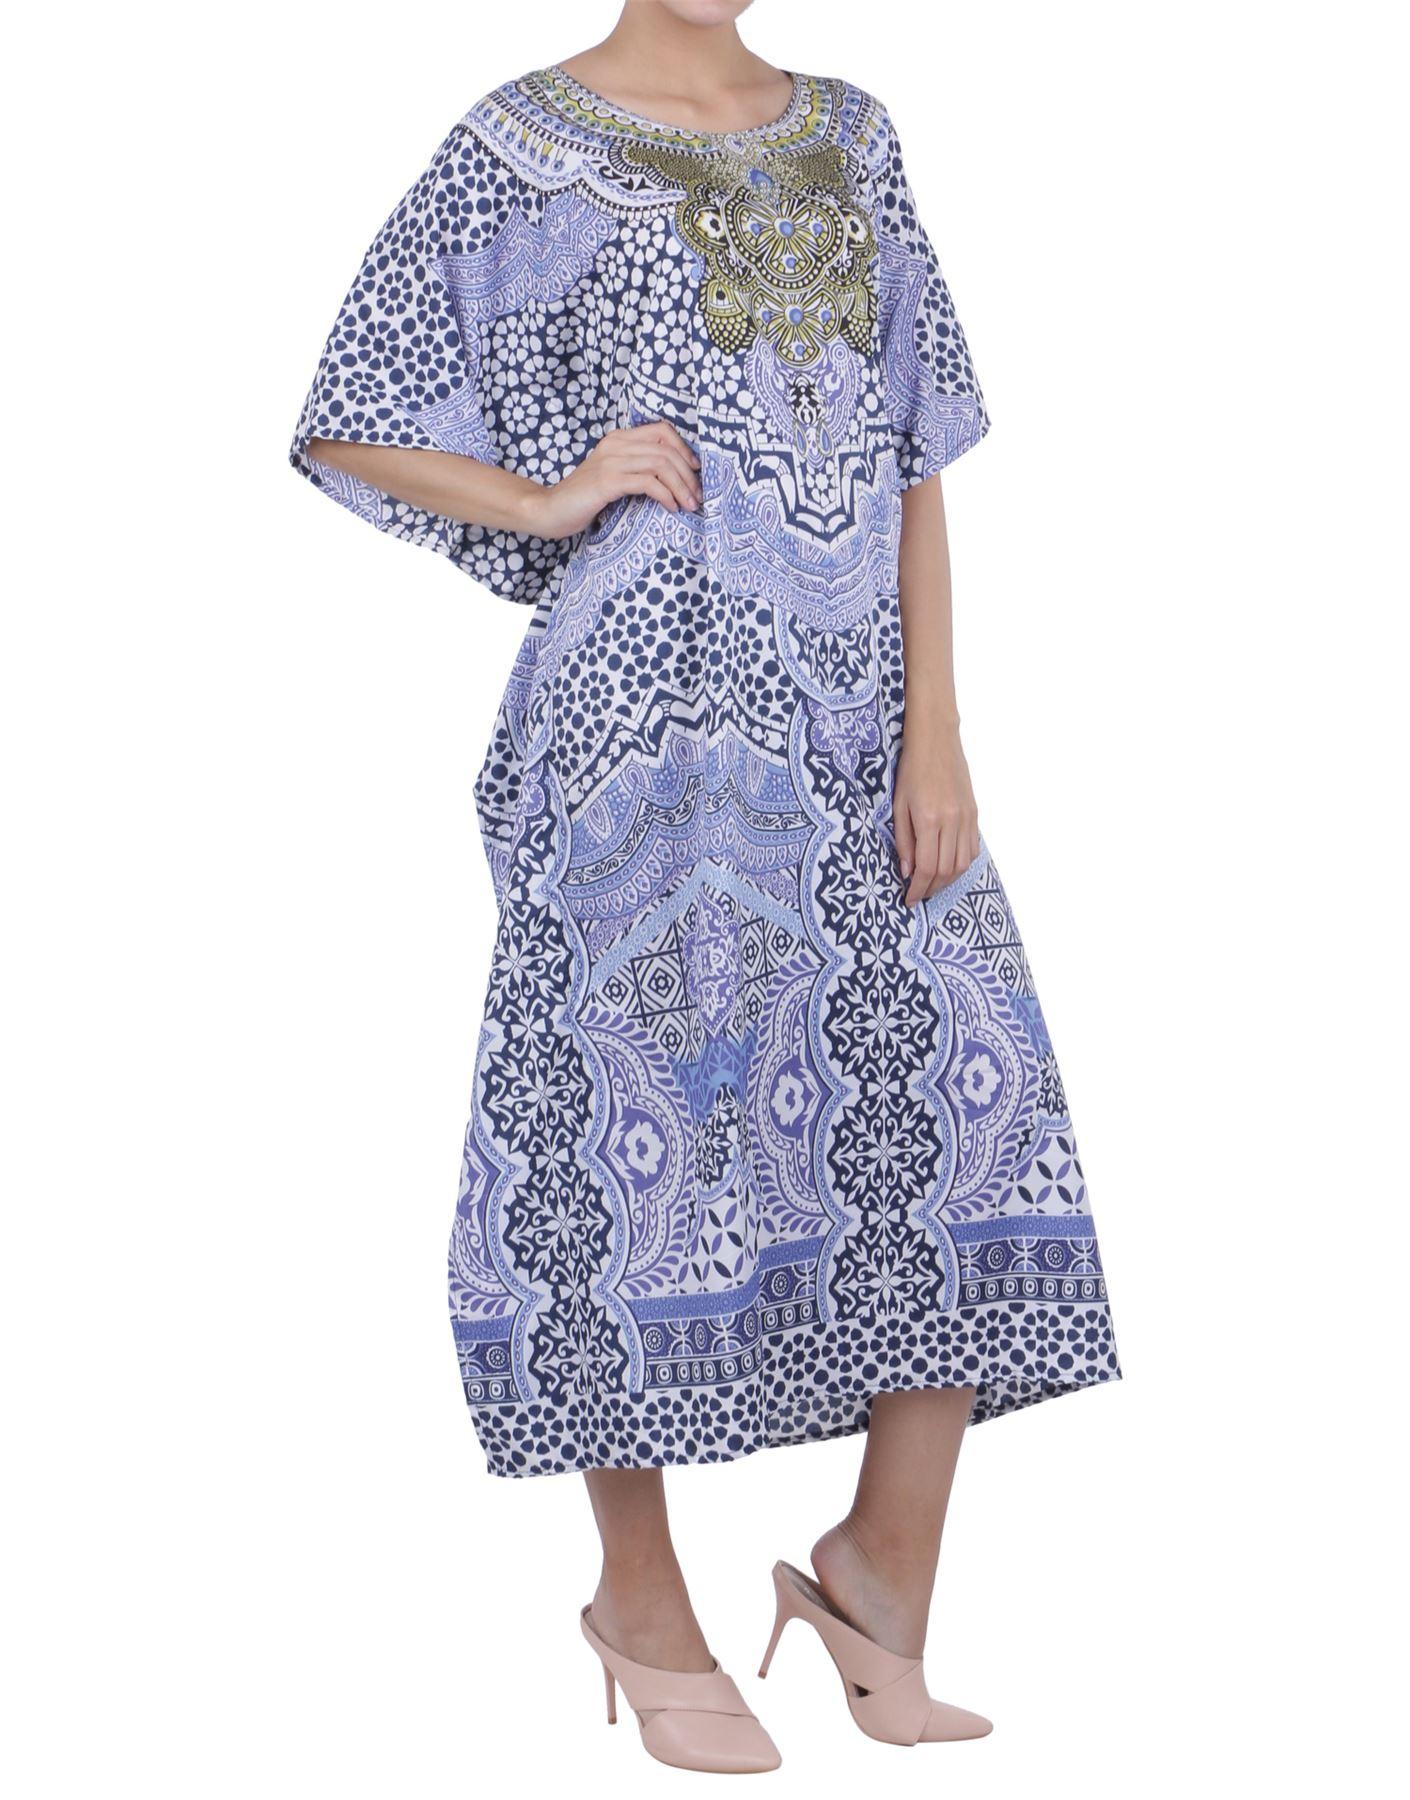 Kaftan Tunic Plus Size Beach Cover Up Maxi Dress Sleepwear Kimonos K131 UK